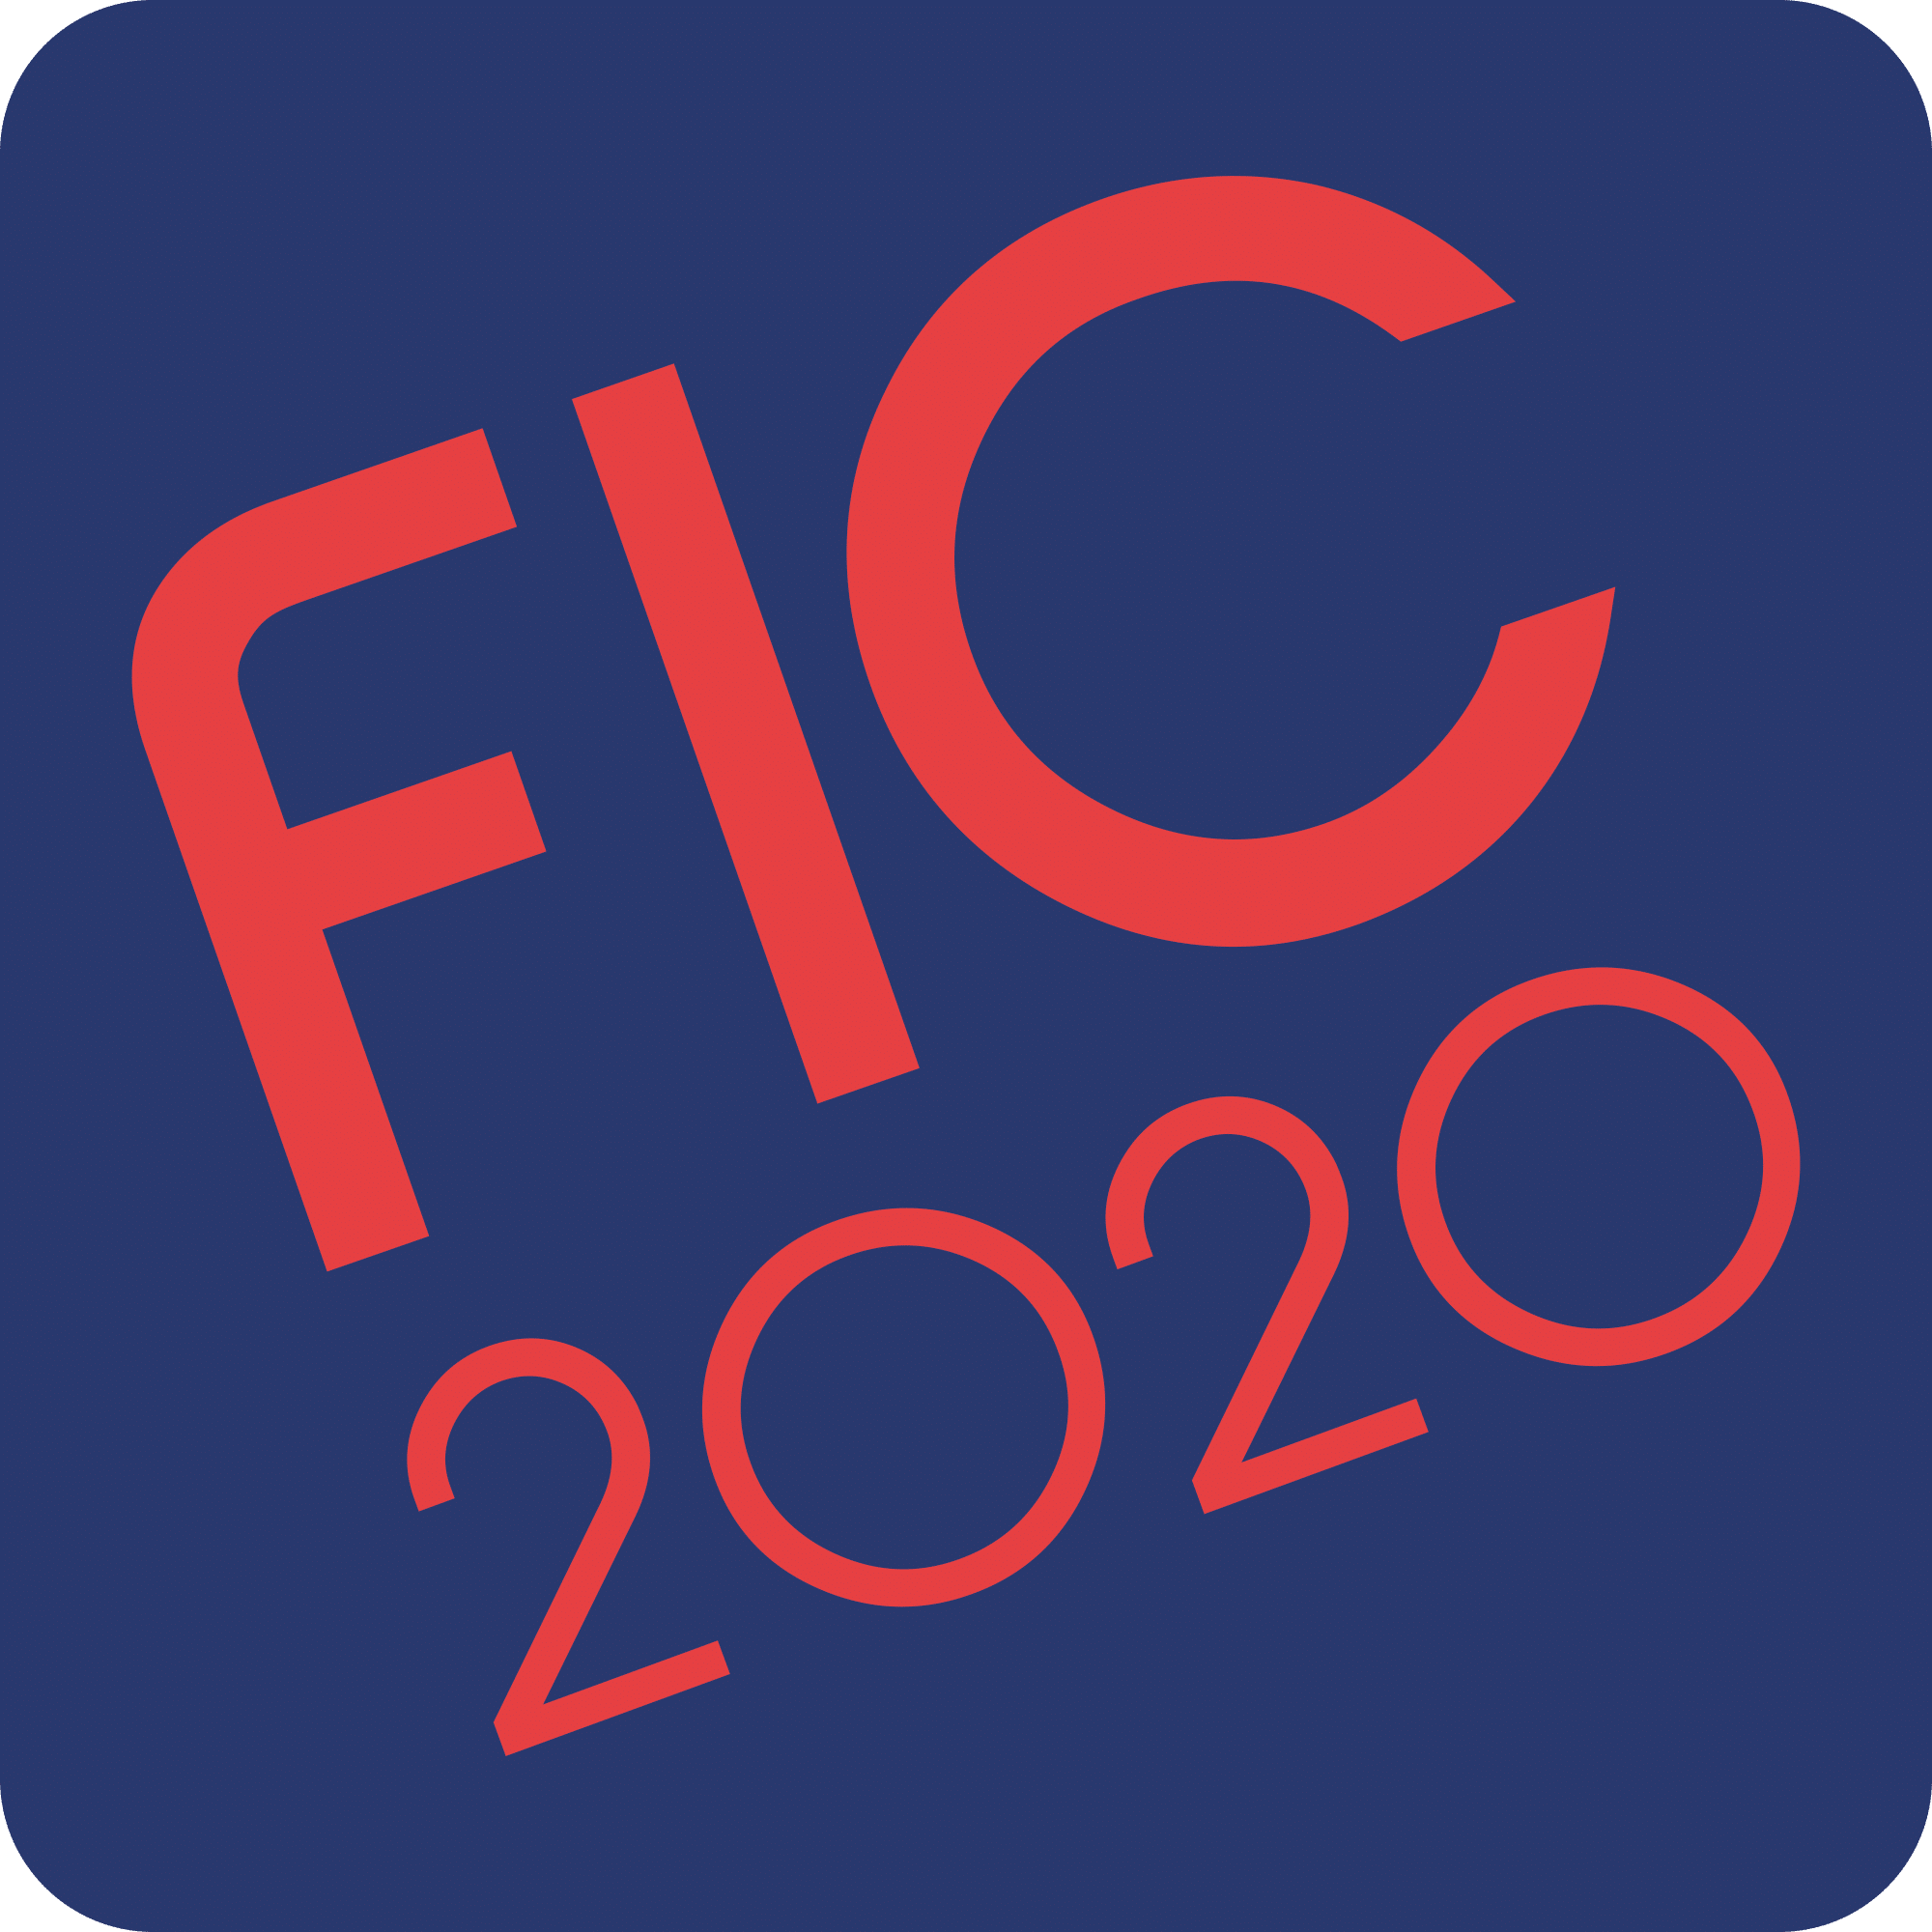 The International Cybersecurity Forum (FIC) 2020